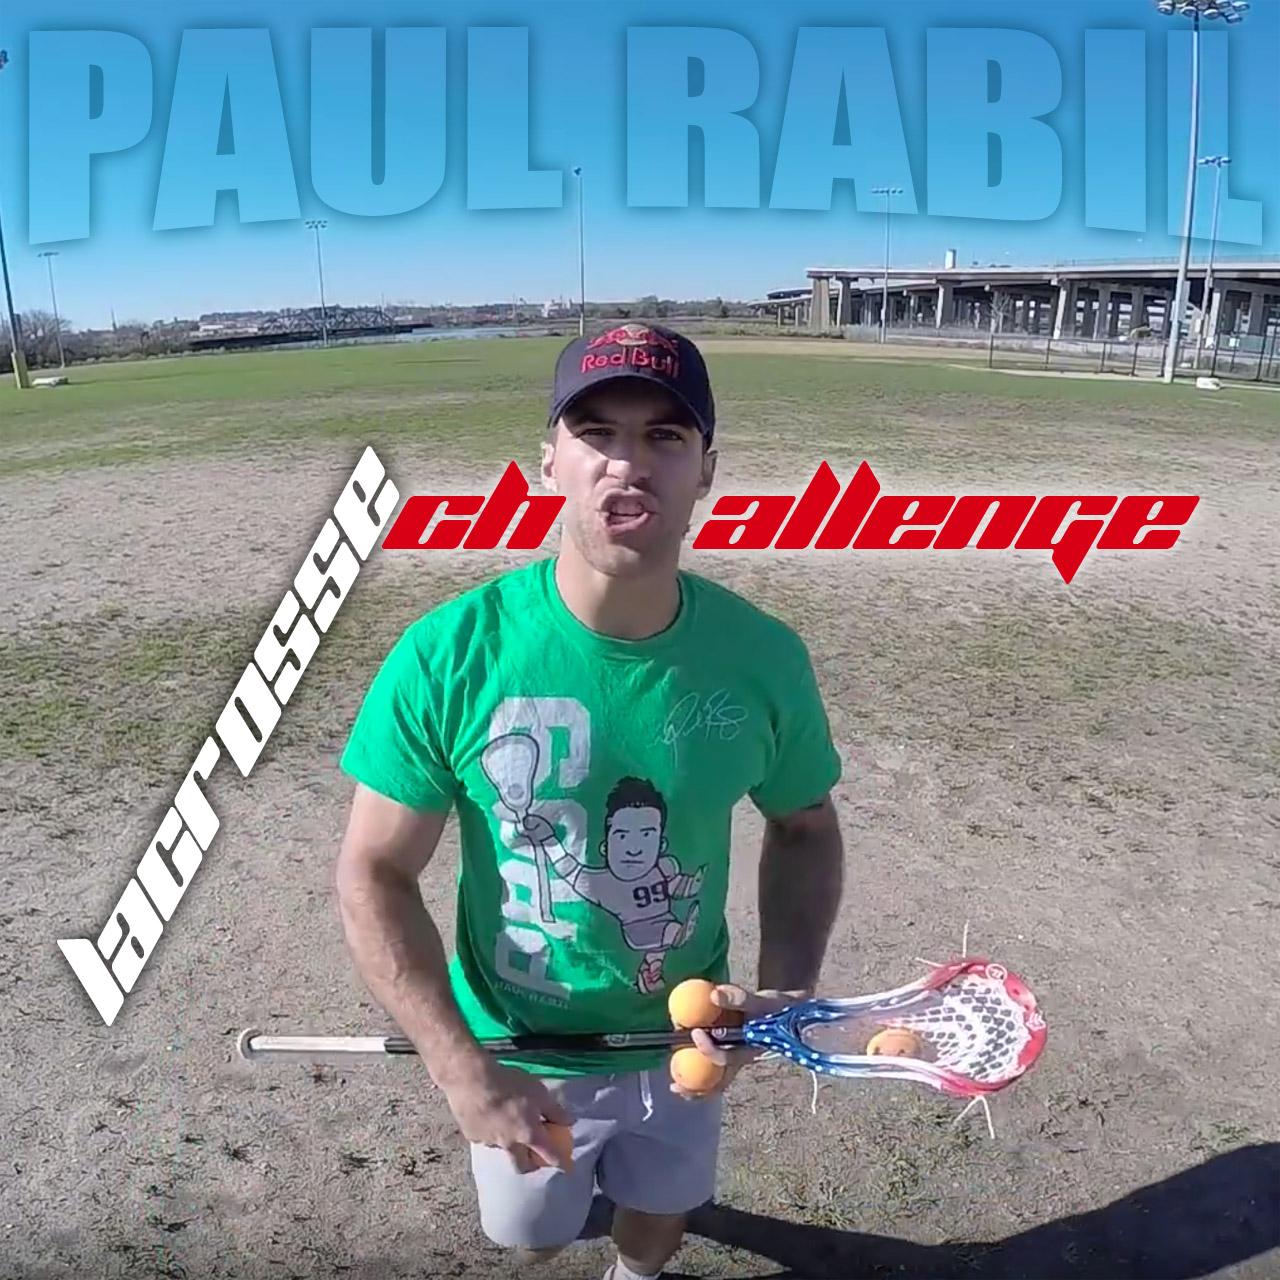 Paul Rabil lacrosse challenge